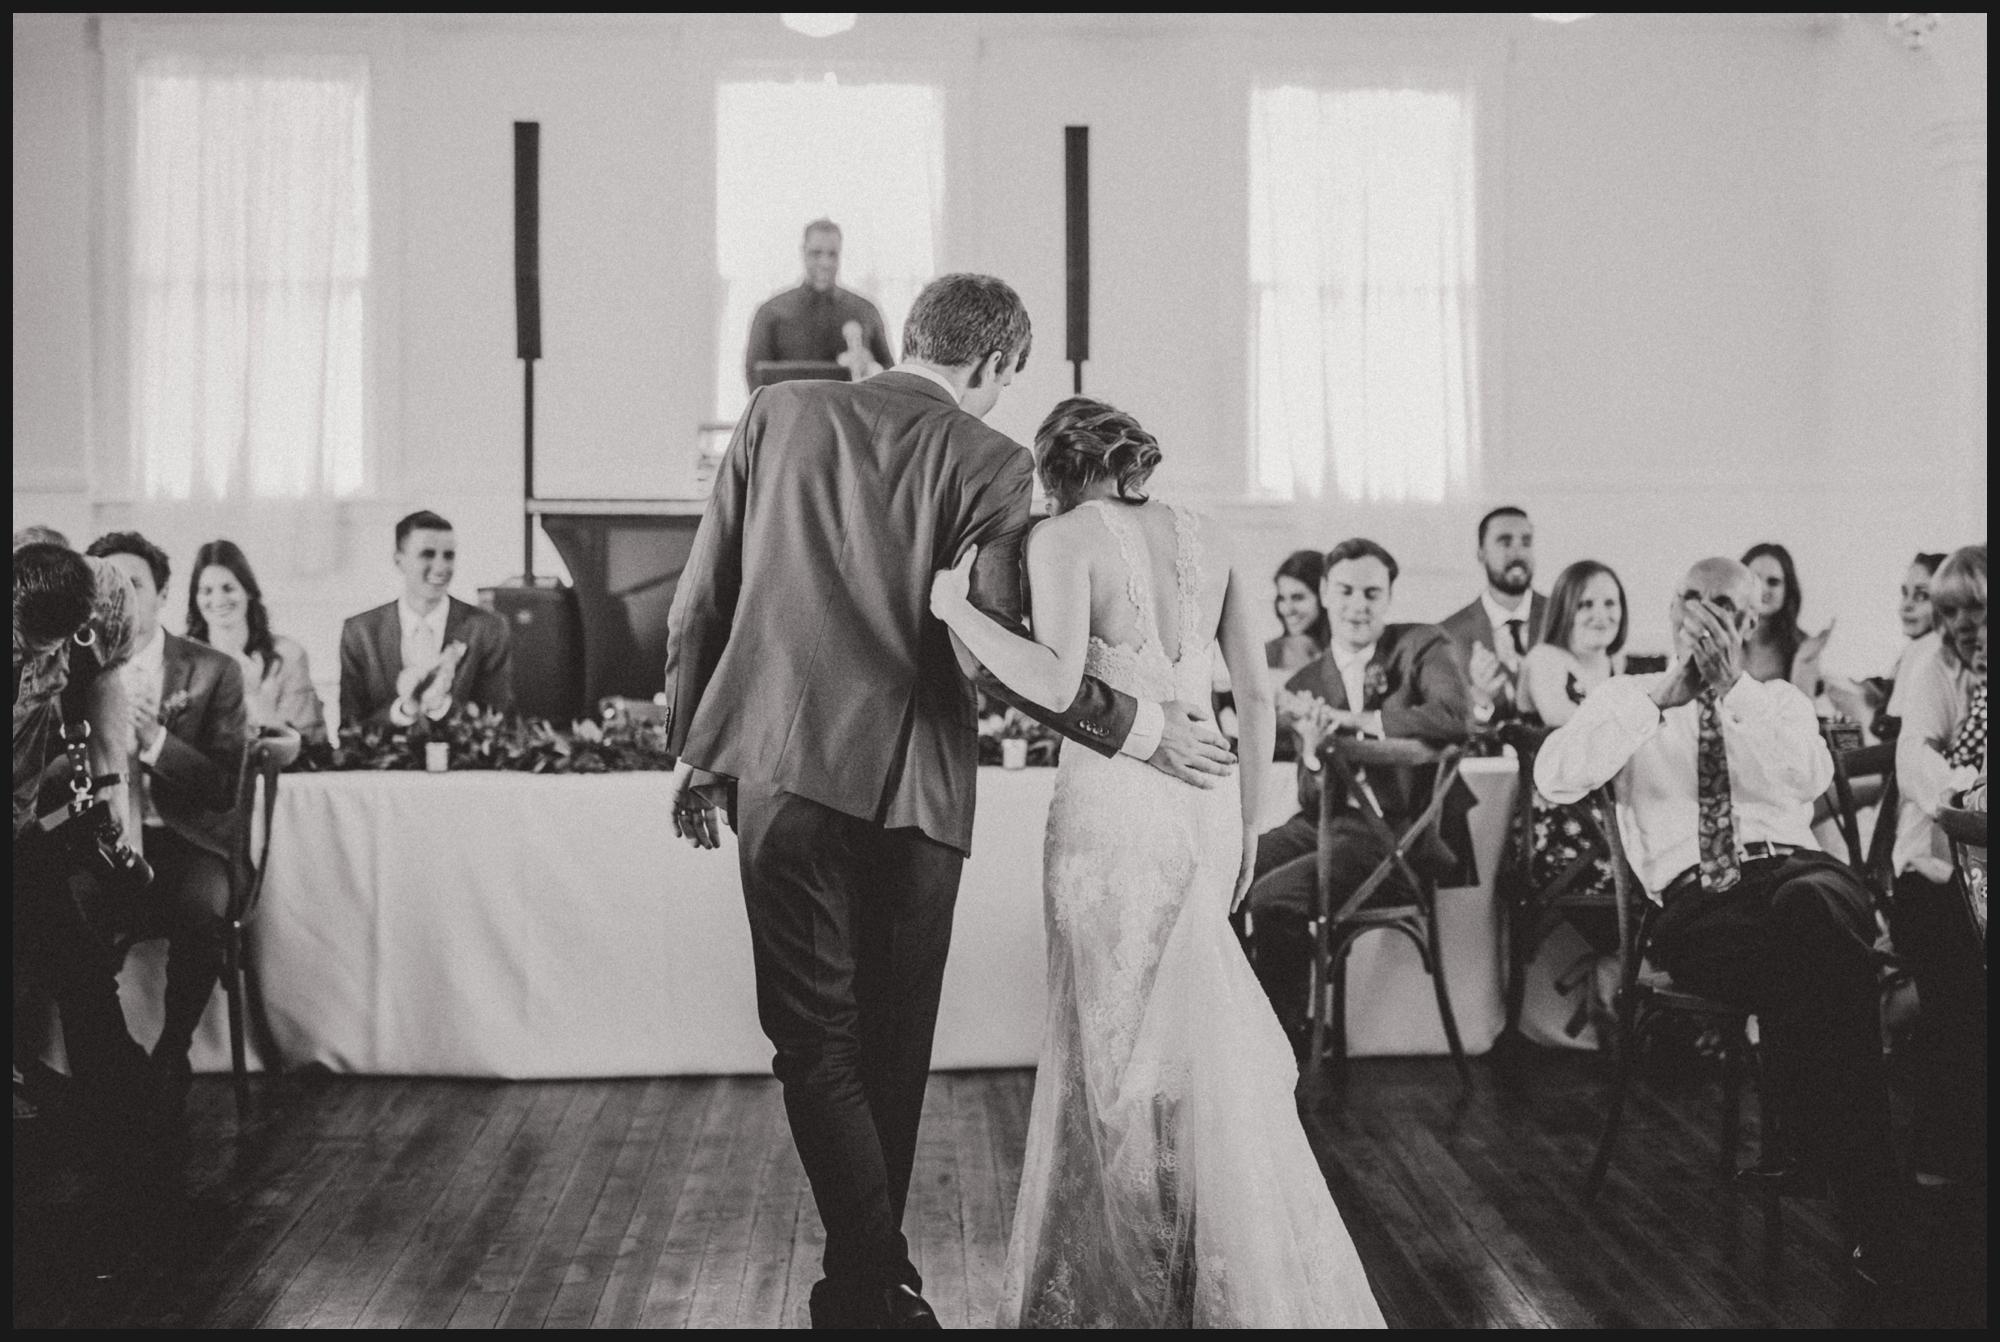 Orlando-Wedding-Photographer-destination-wedding-photographer-florida-wedding-photographer-bohemian-wedding-photographer_1776.jpg